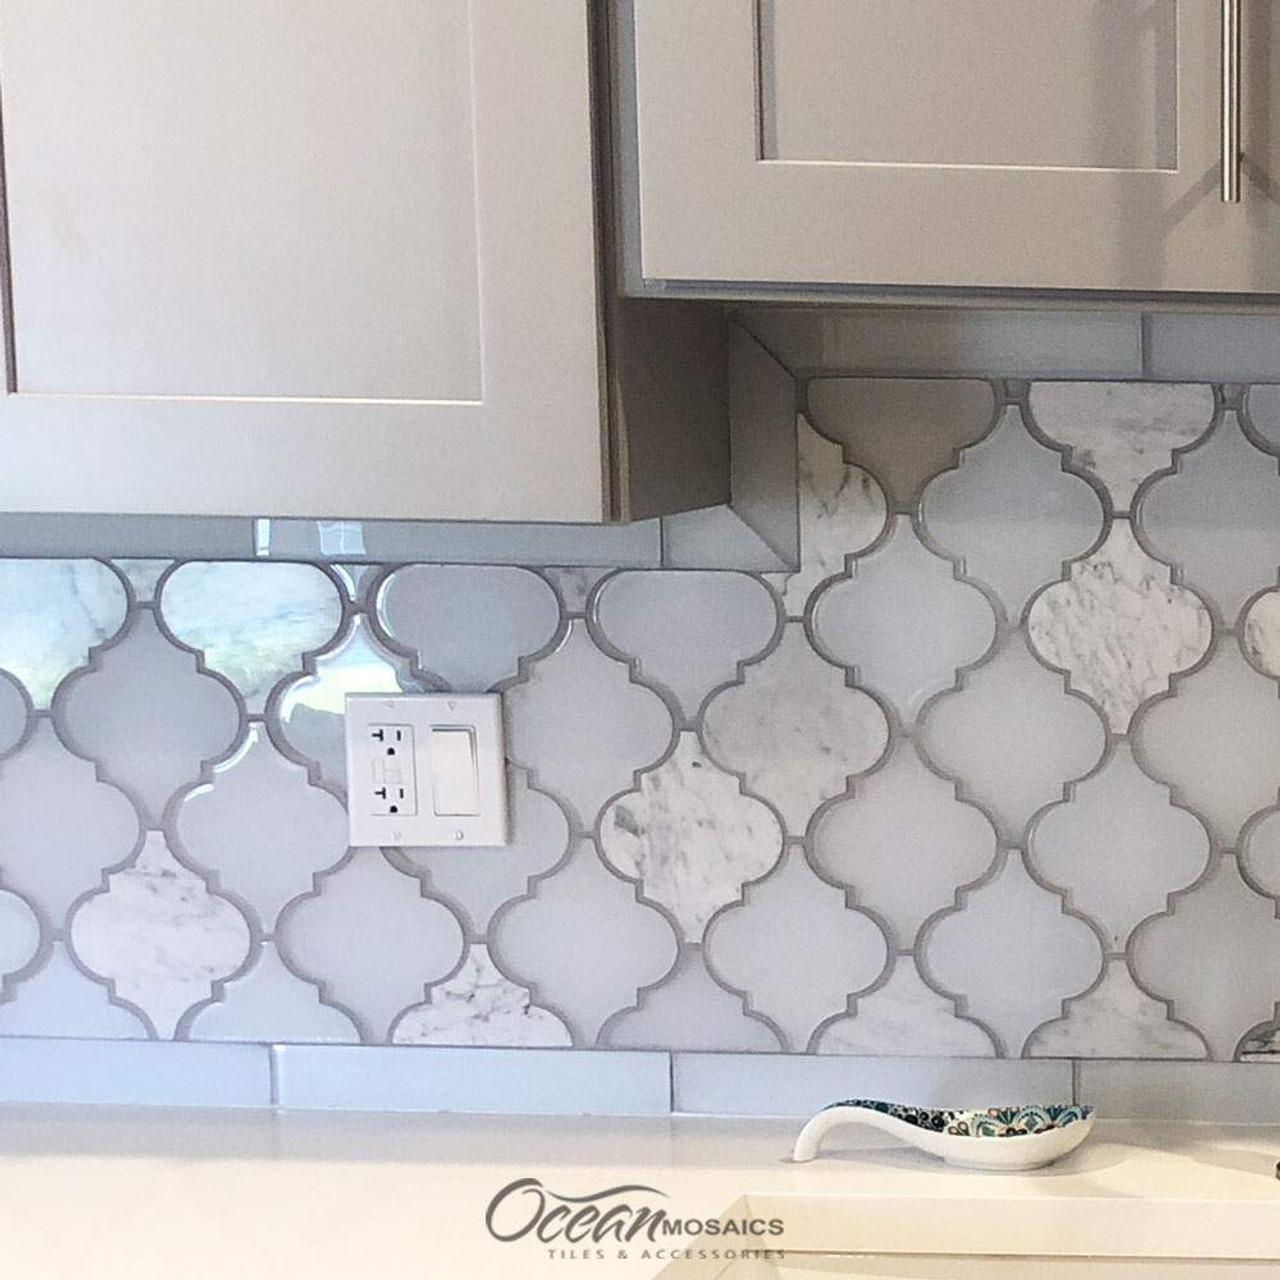 Image of: Clover Arabesque Blanco Mosaic Glass Tile